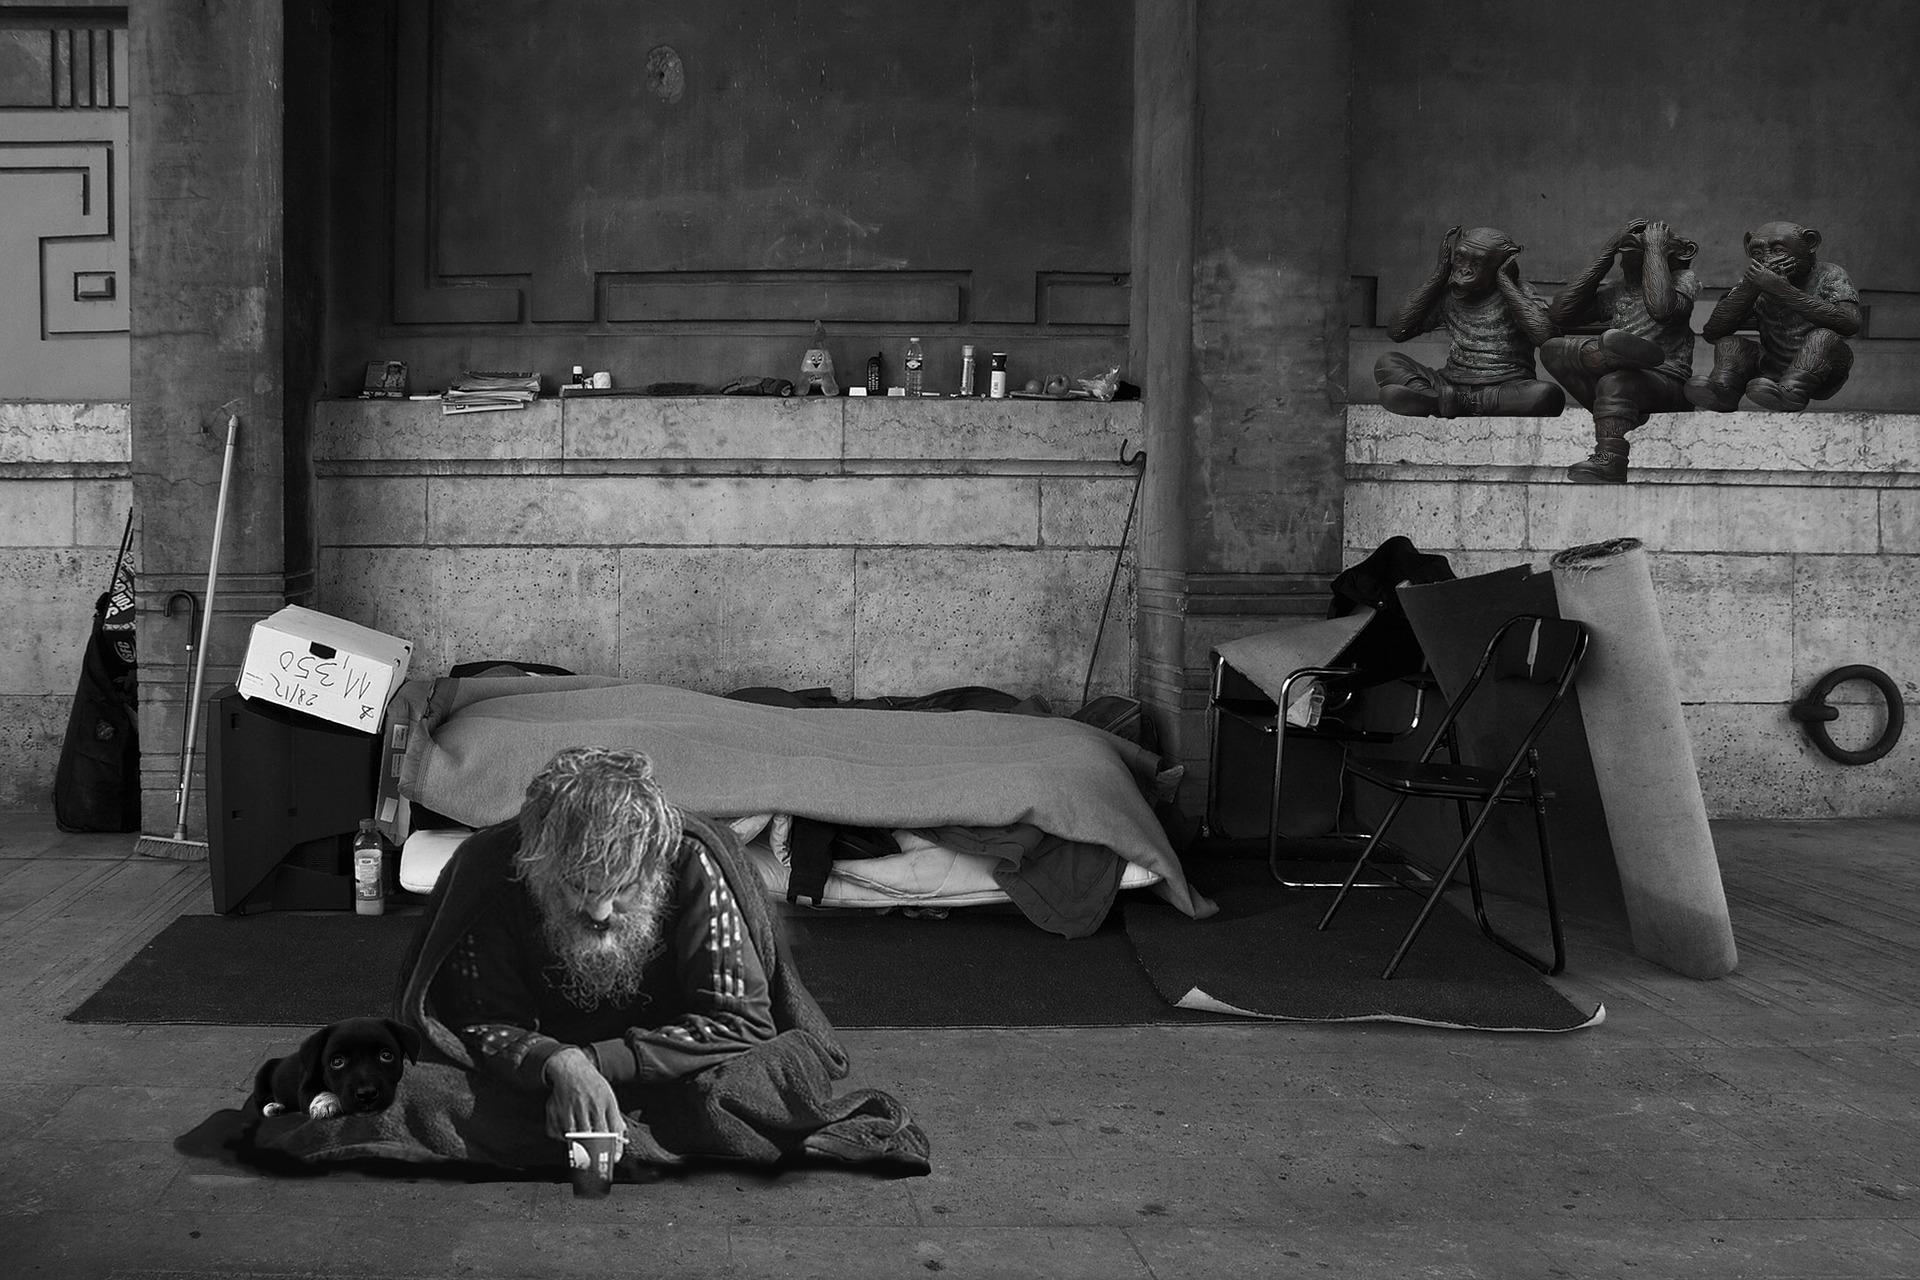 homeless-man-2653445_1920